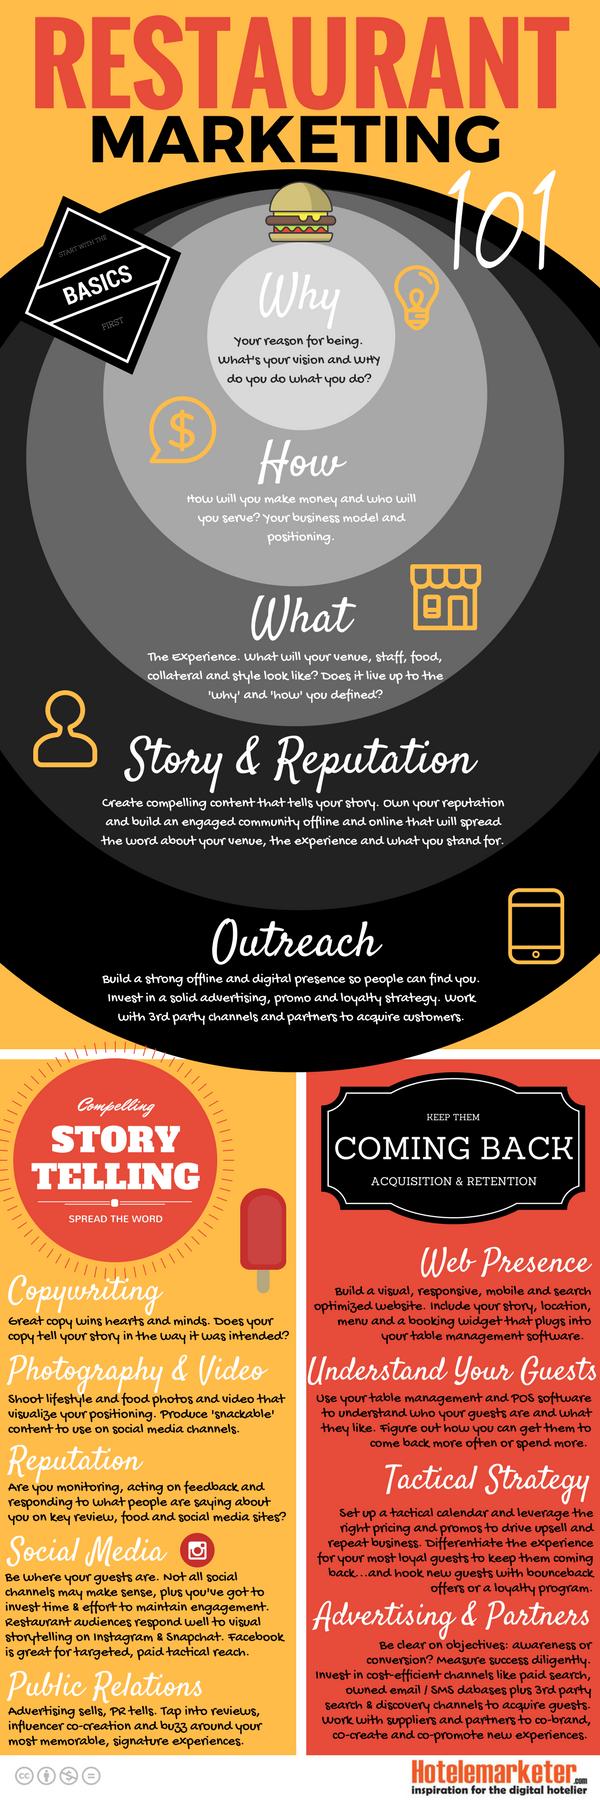 restaurant-marketing-infographic